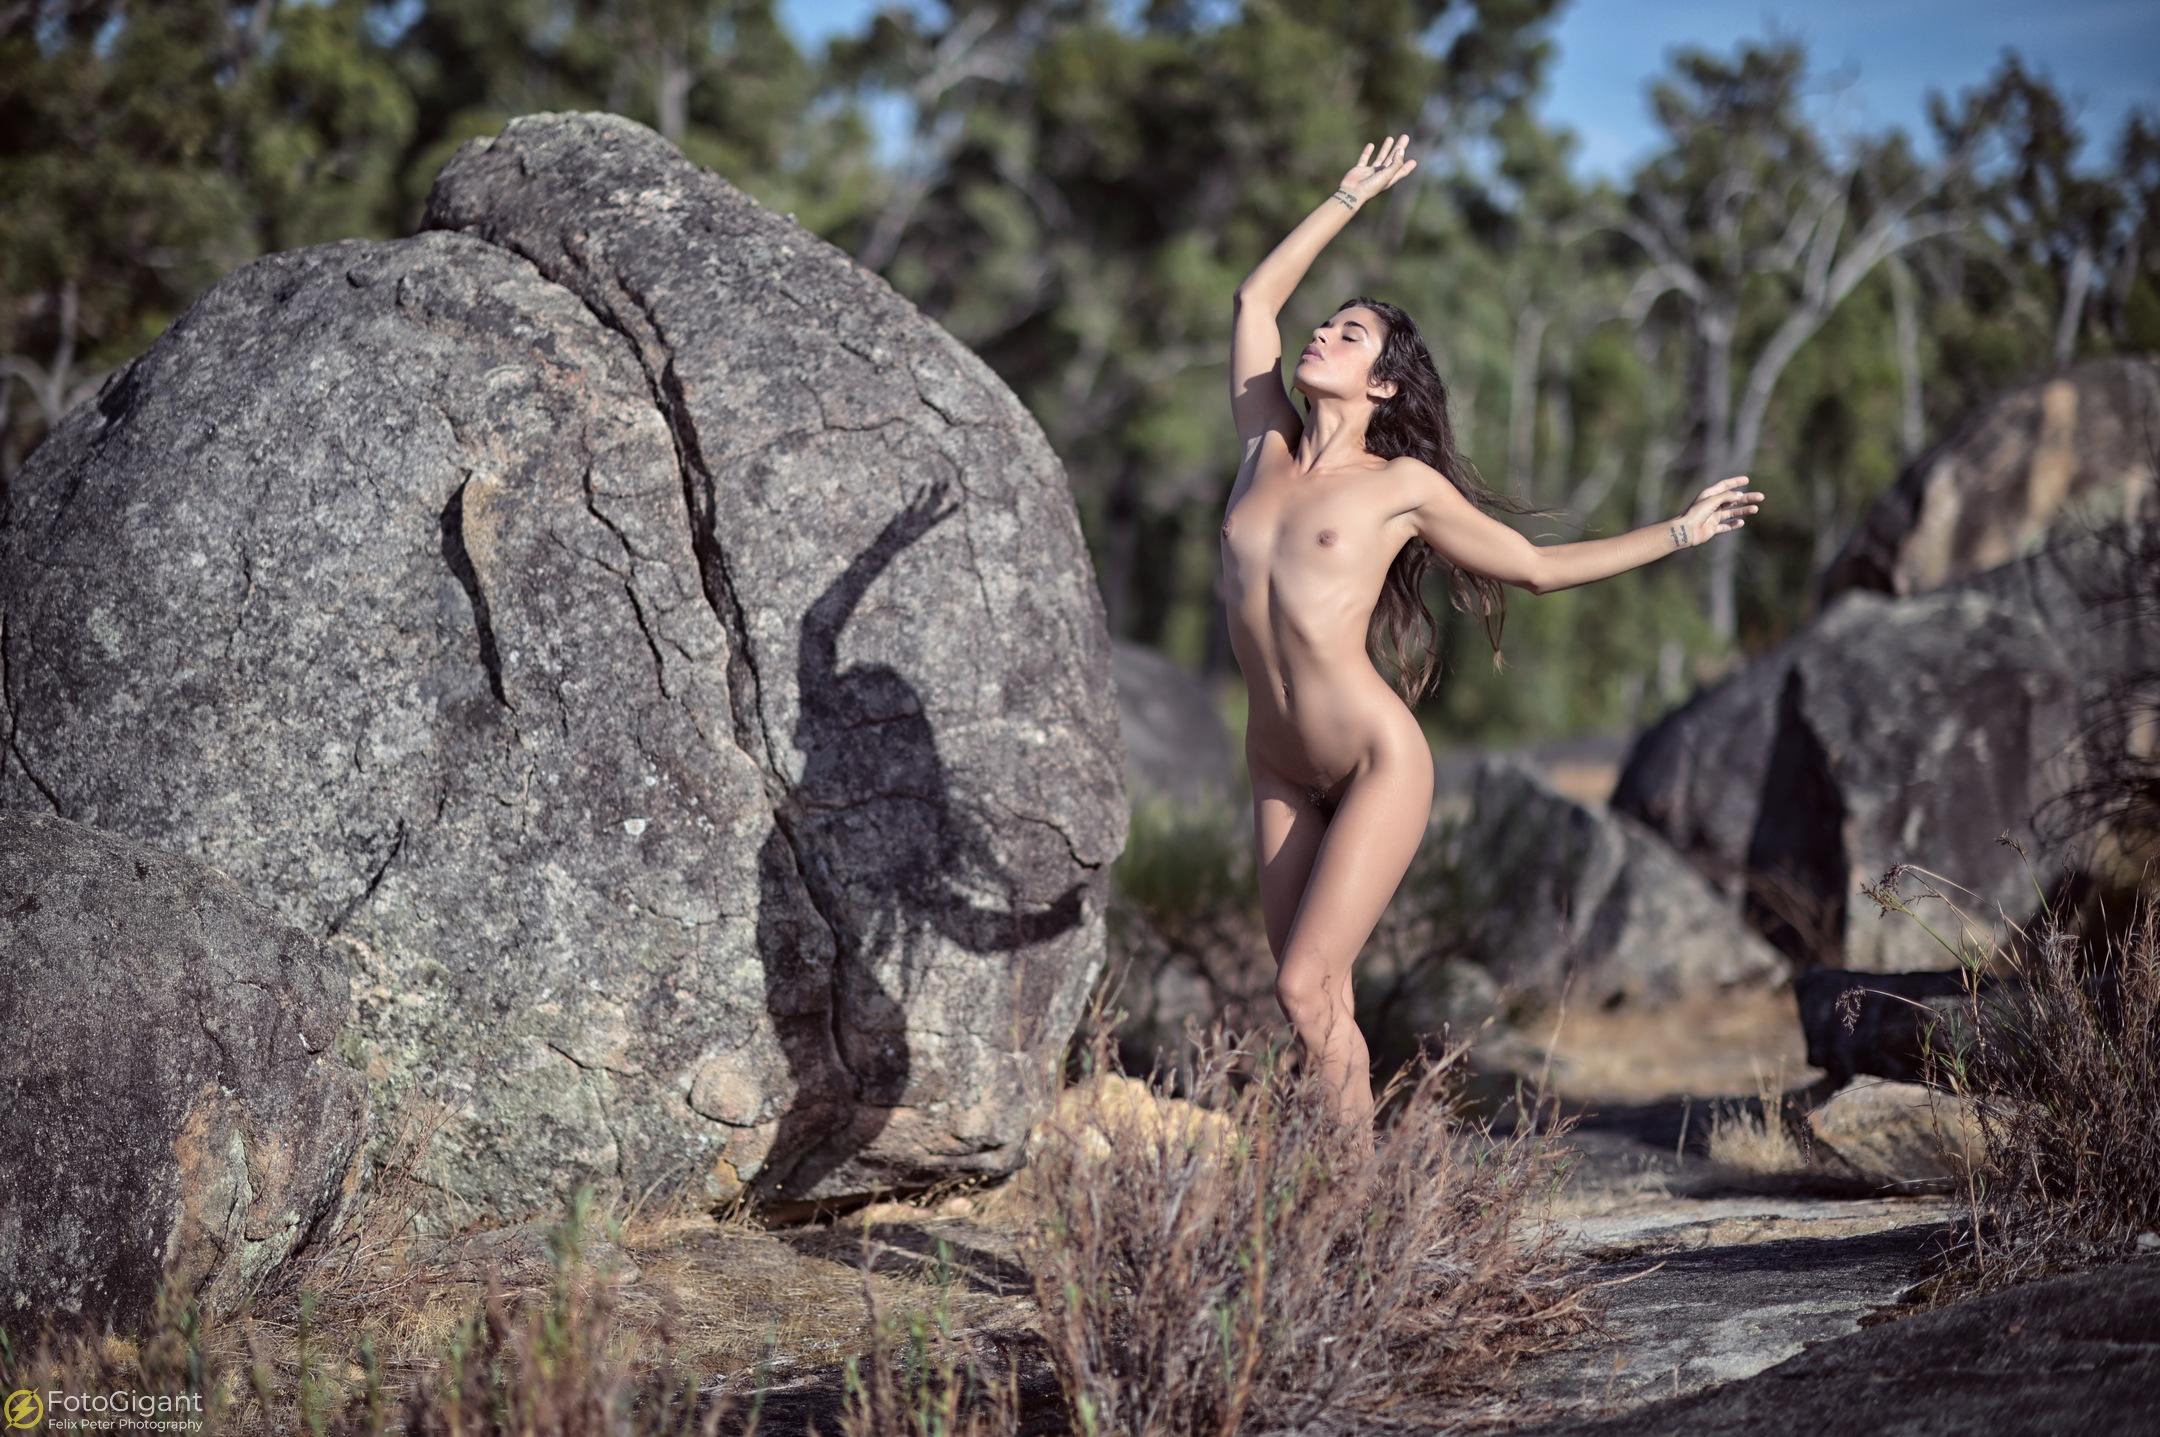 NudeArt_Aktfotografie_Eva-Luna_16.jpg